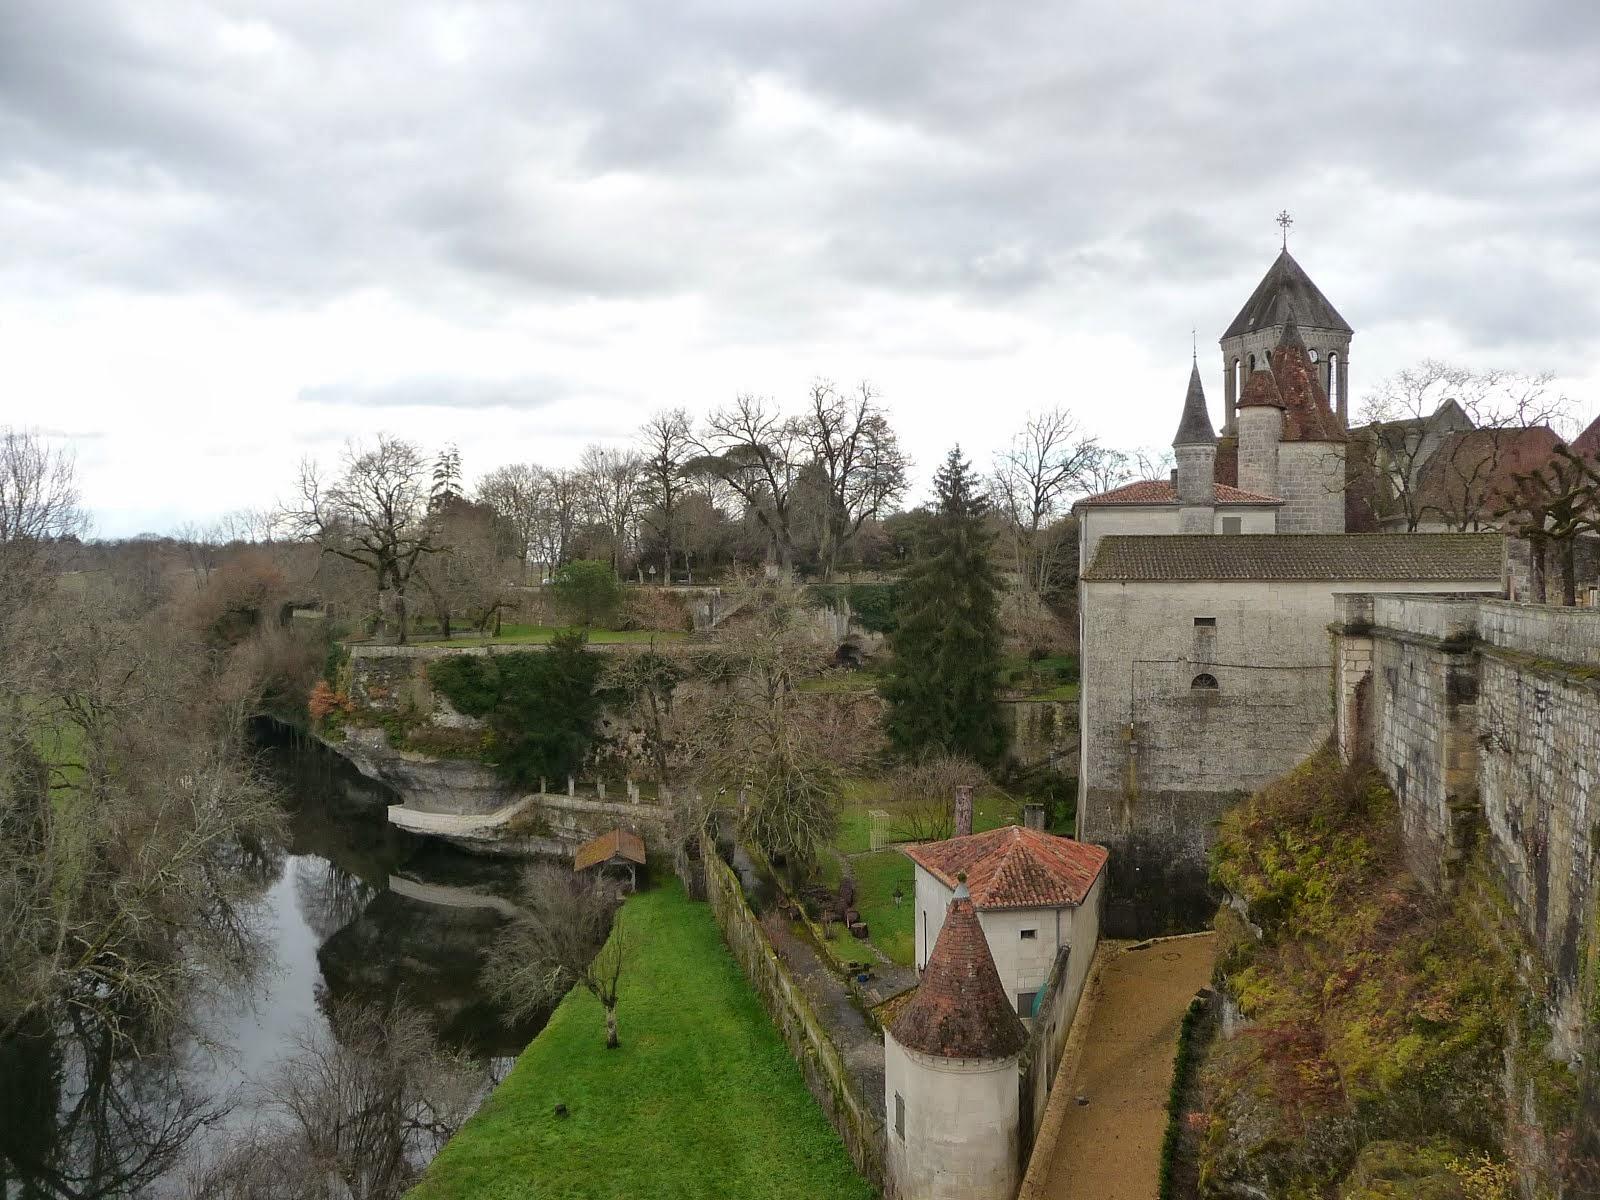 River Dronne seen from the battlements of Bourdielles Castle